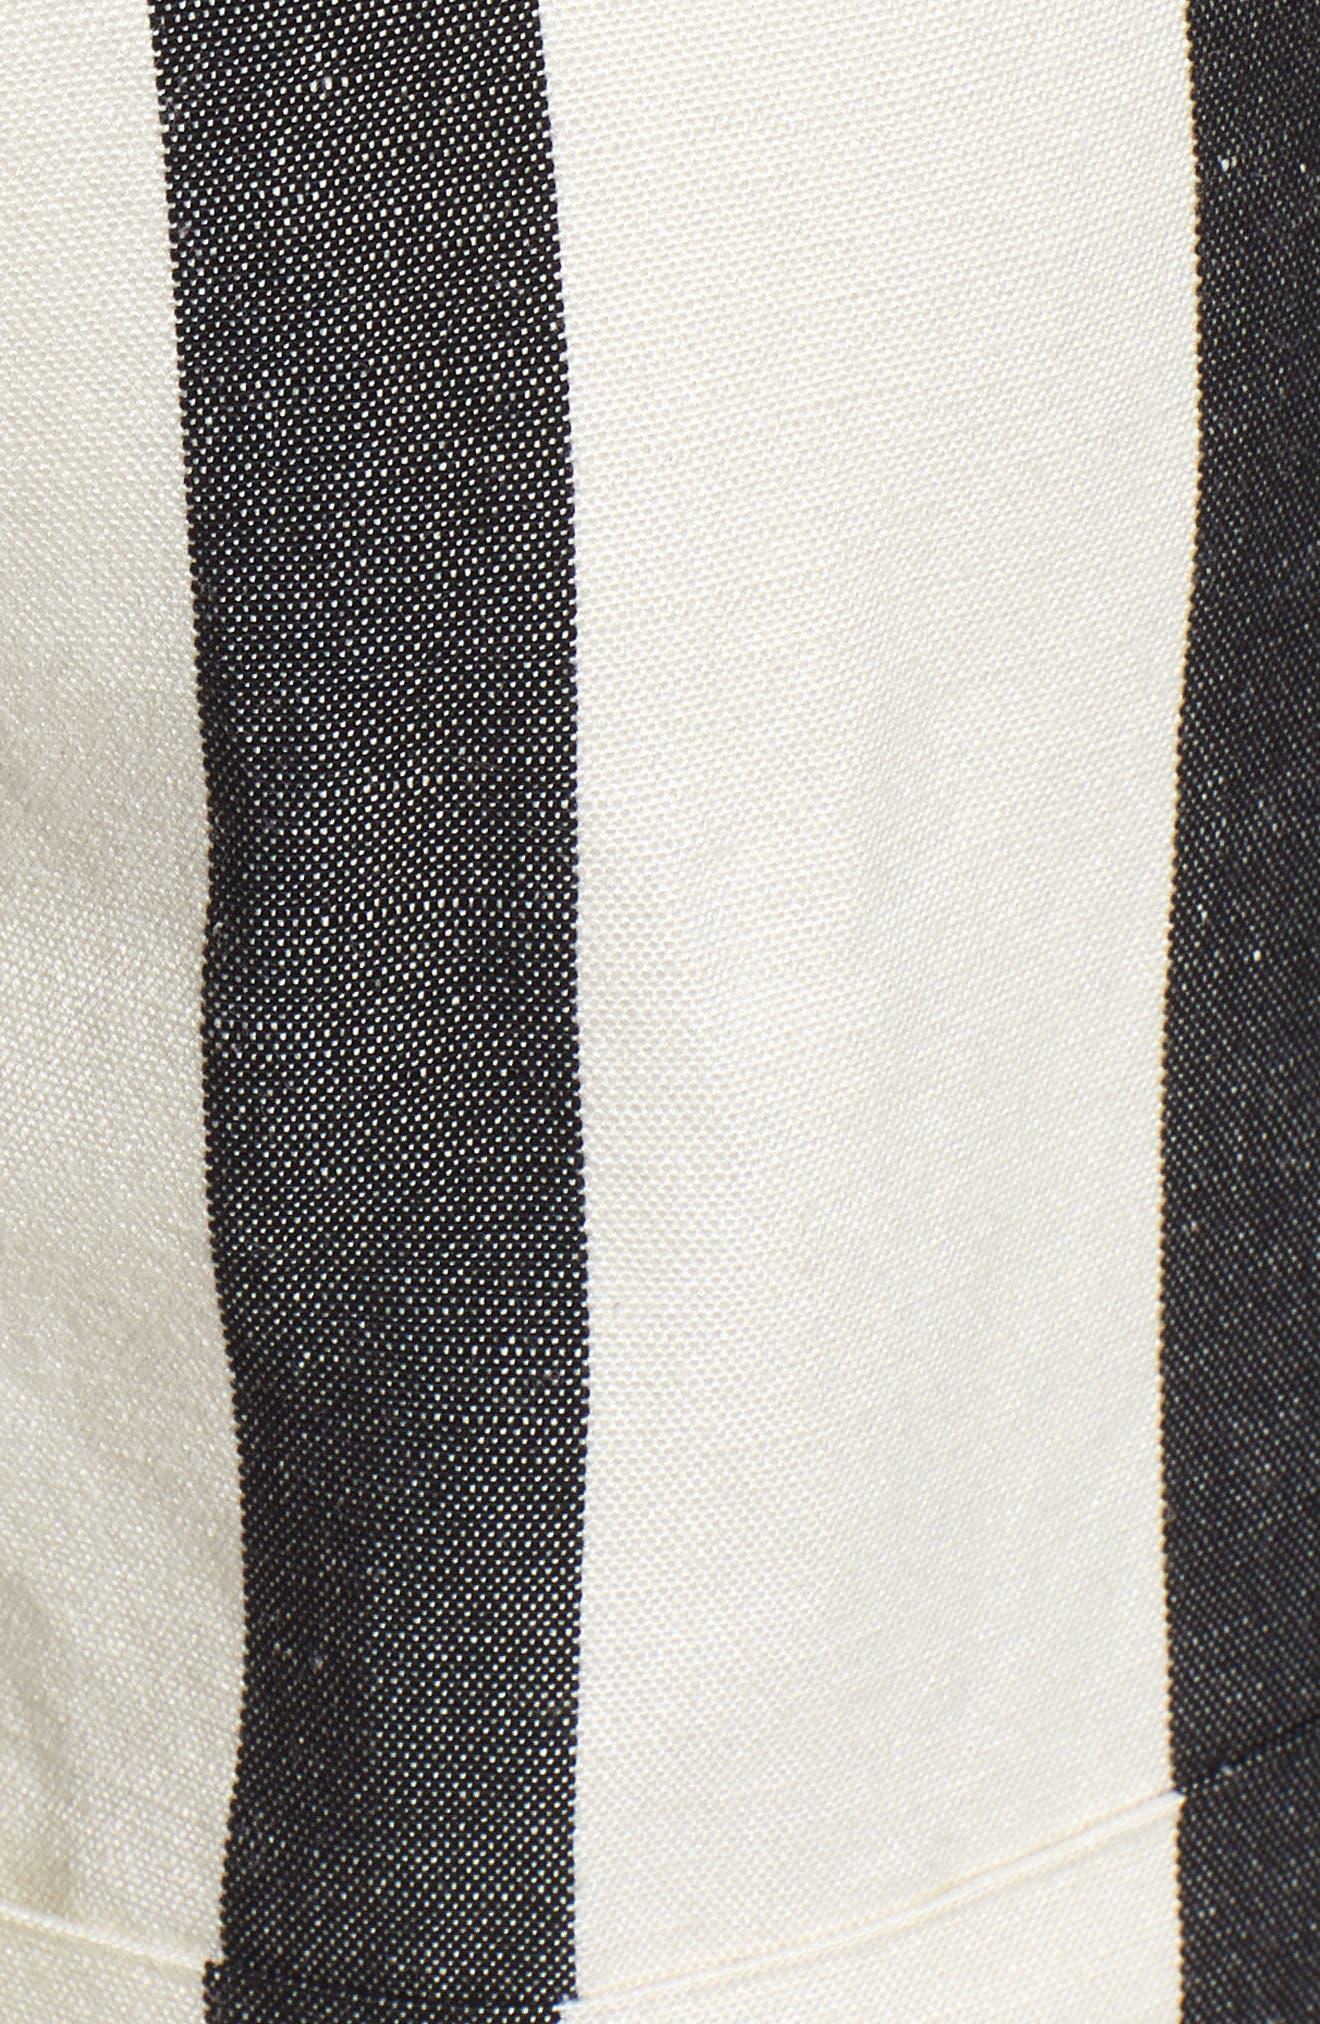 Stripe Cuff Shorts,                             Alternate thumbnail 5, color,                             101